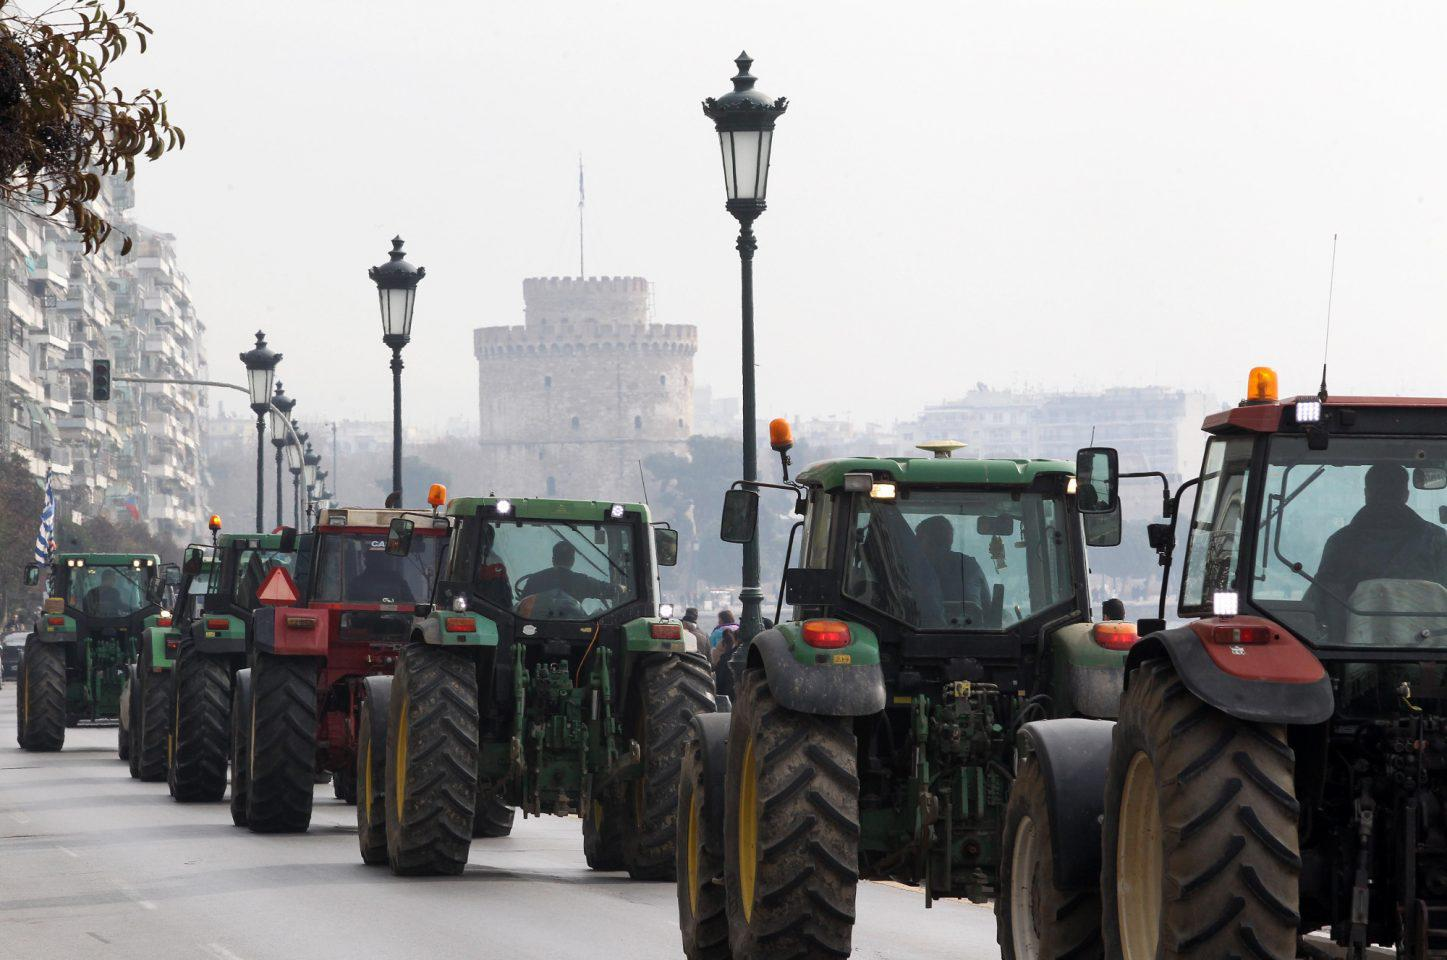 agrotes-1300 Με κόρνες και κροτίδες στο υπουργείο Μακεδονίας-Θράκης οι αγρότες [εικόνες & βίντεο]